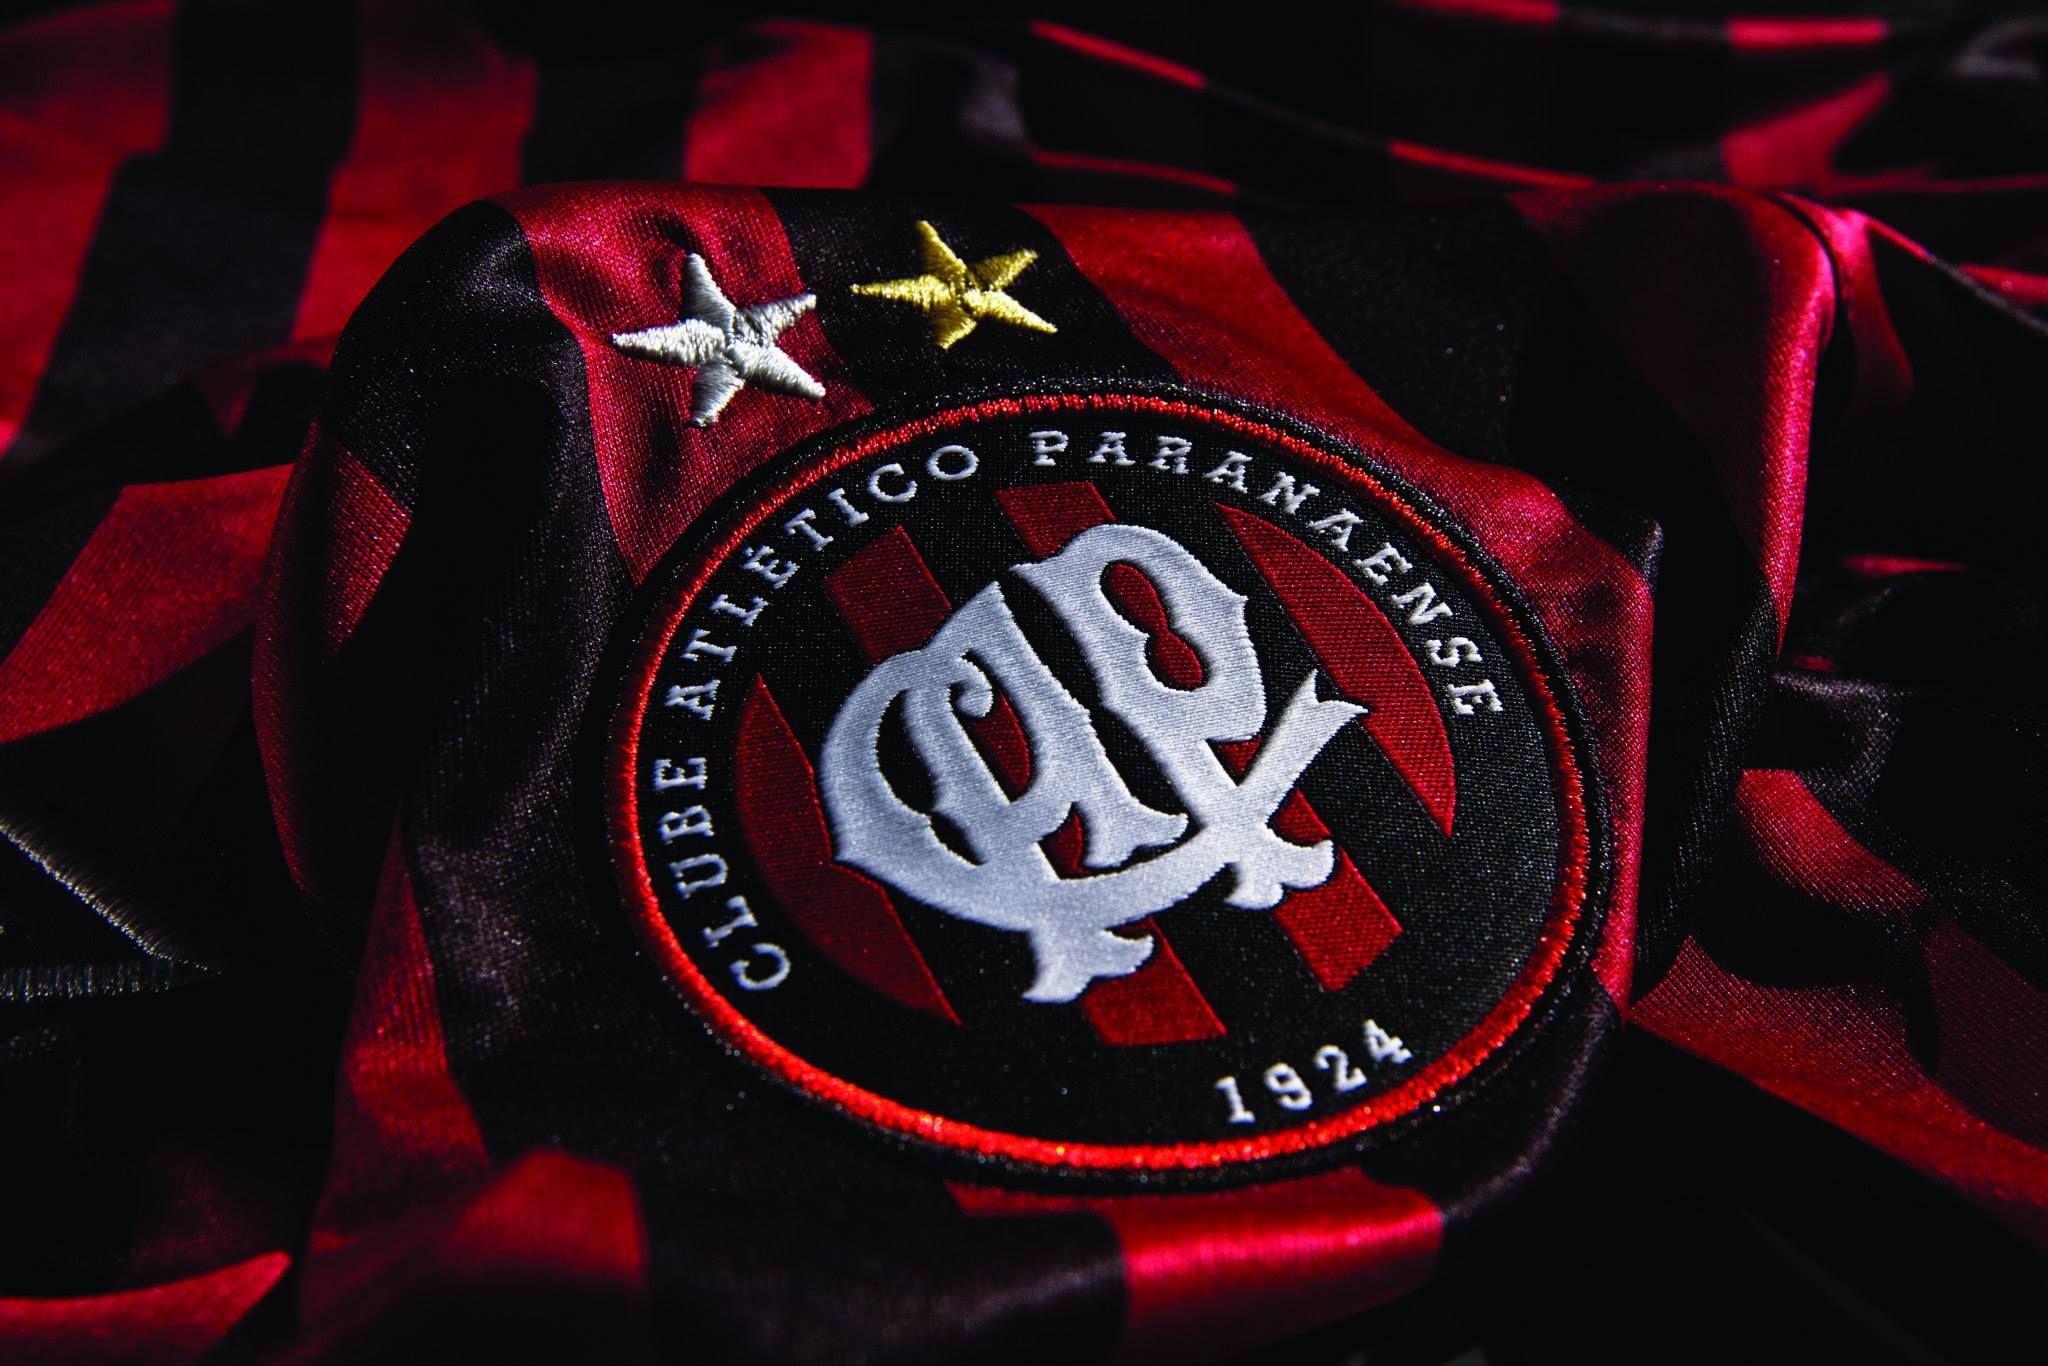 Clube Atletico Paranaense